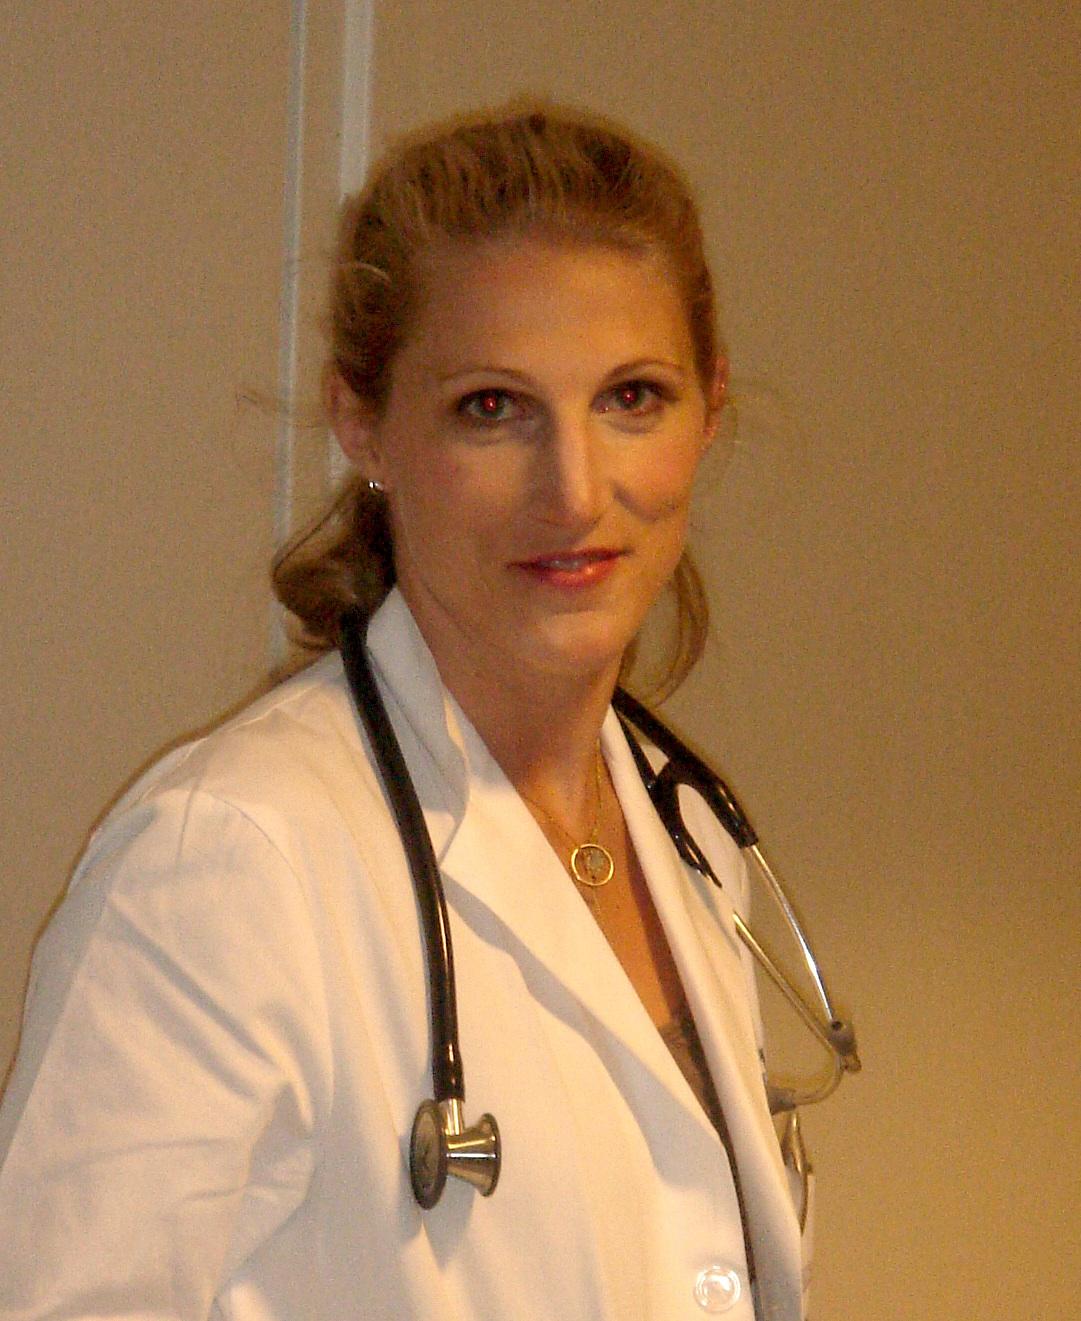 boston university medical school secondary essay